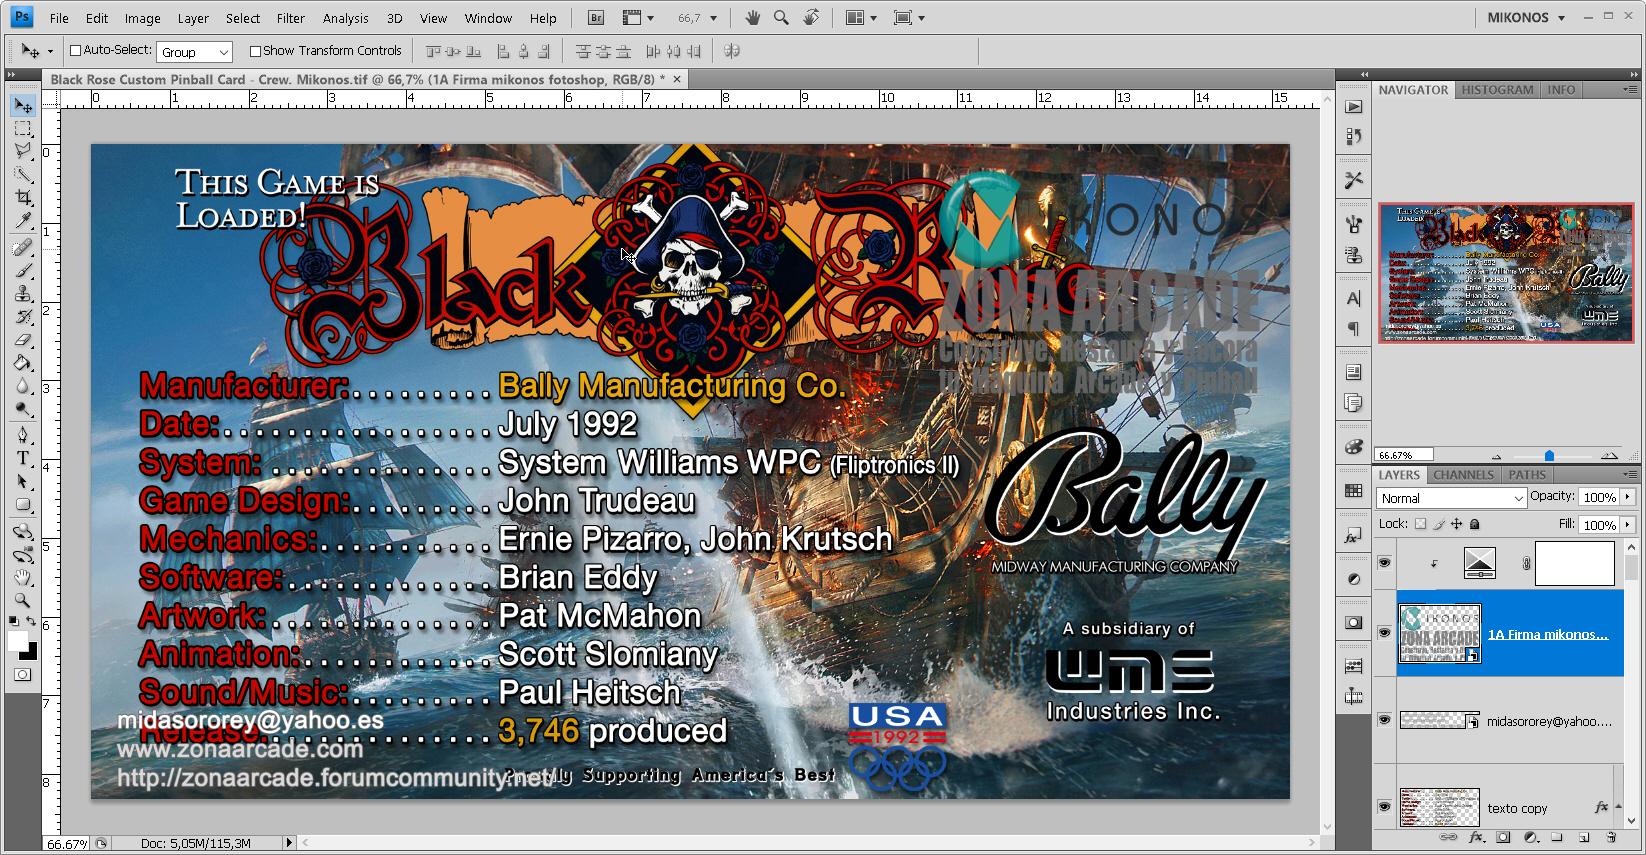 Black%20Rose%20Custom%20Pinball%20Card%20-%20Crew.%20Mikonos1.jpg